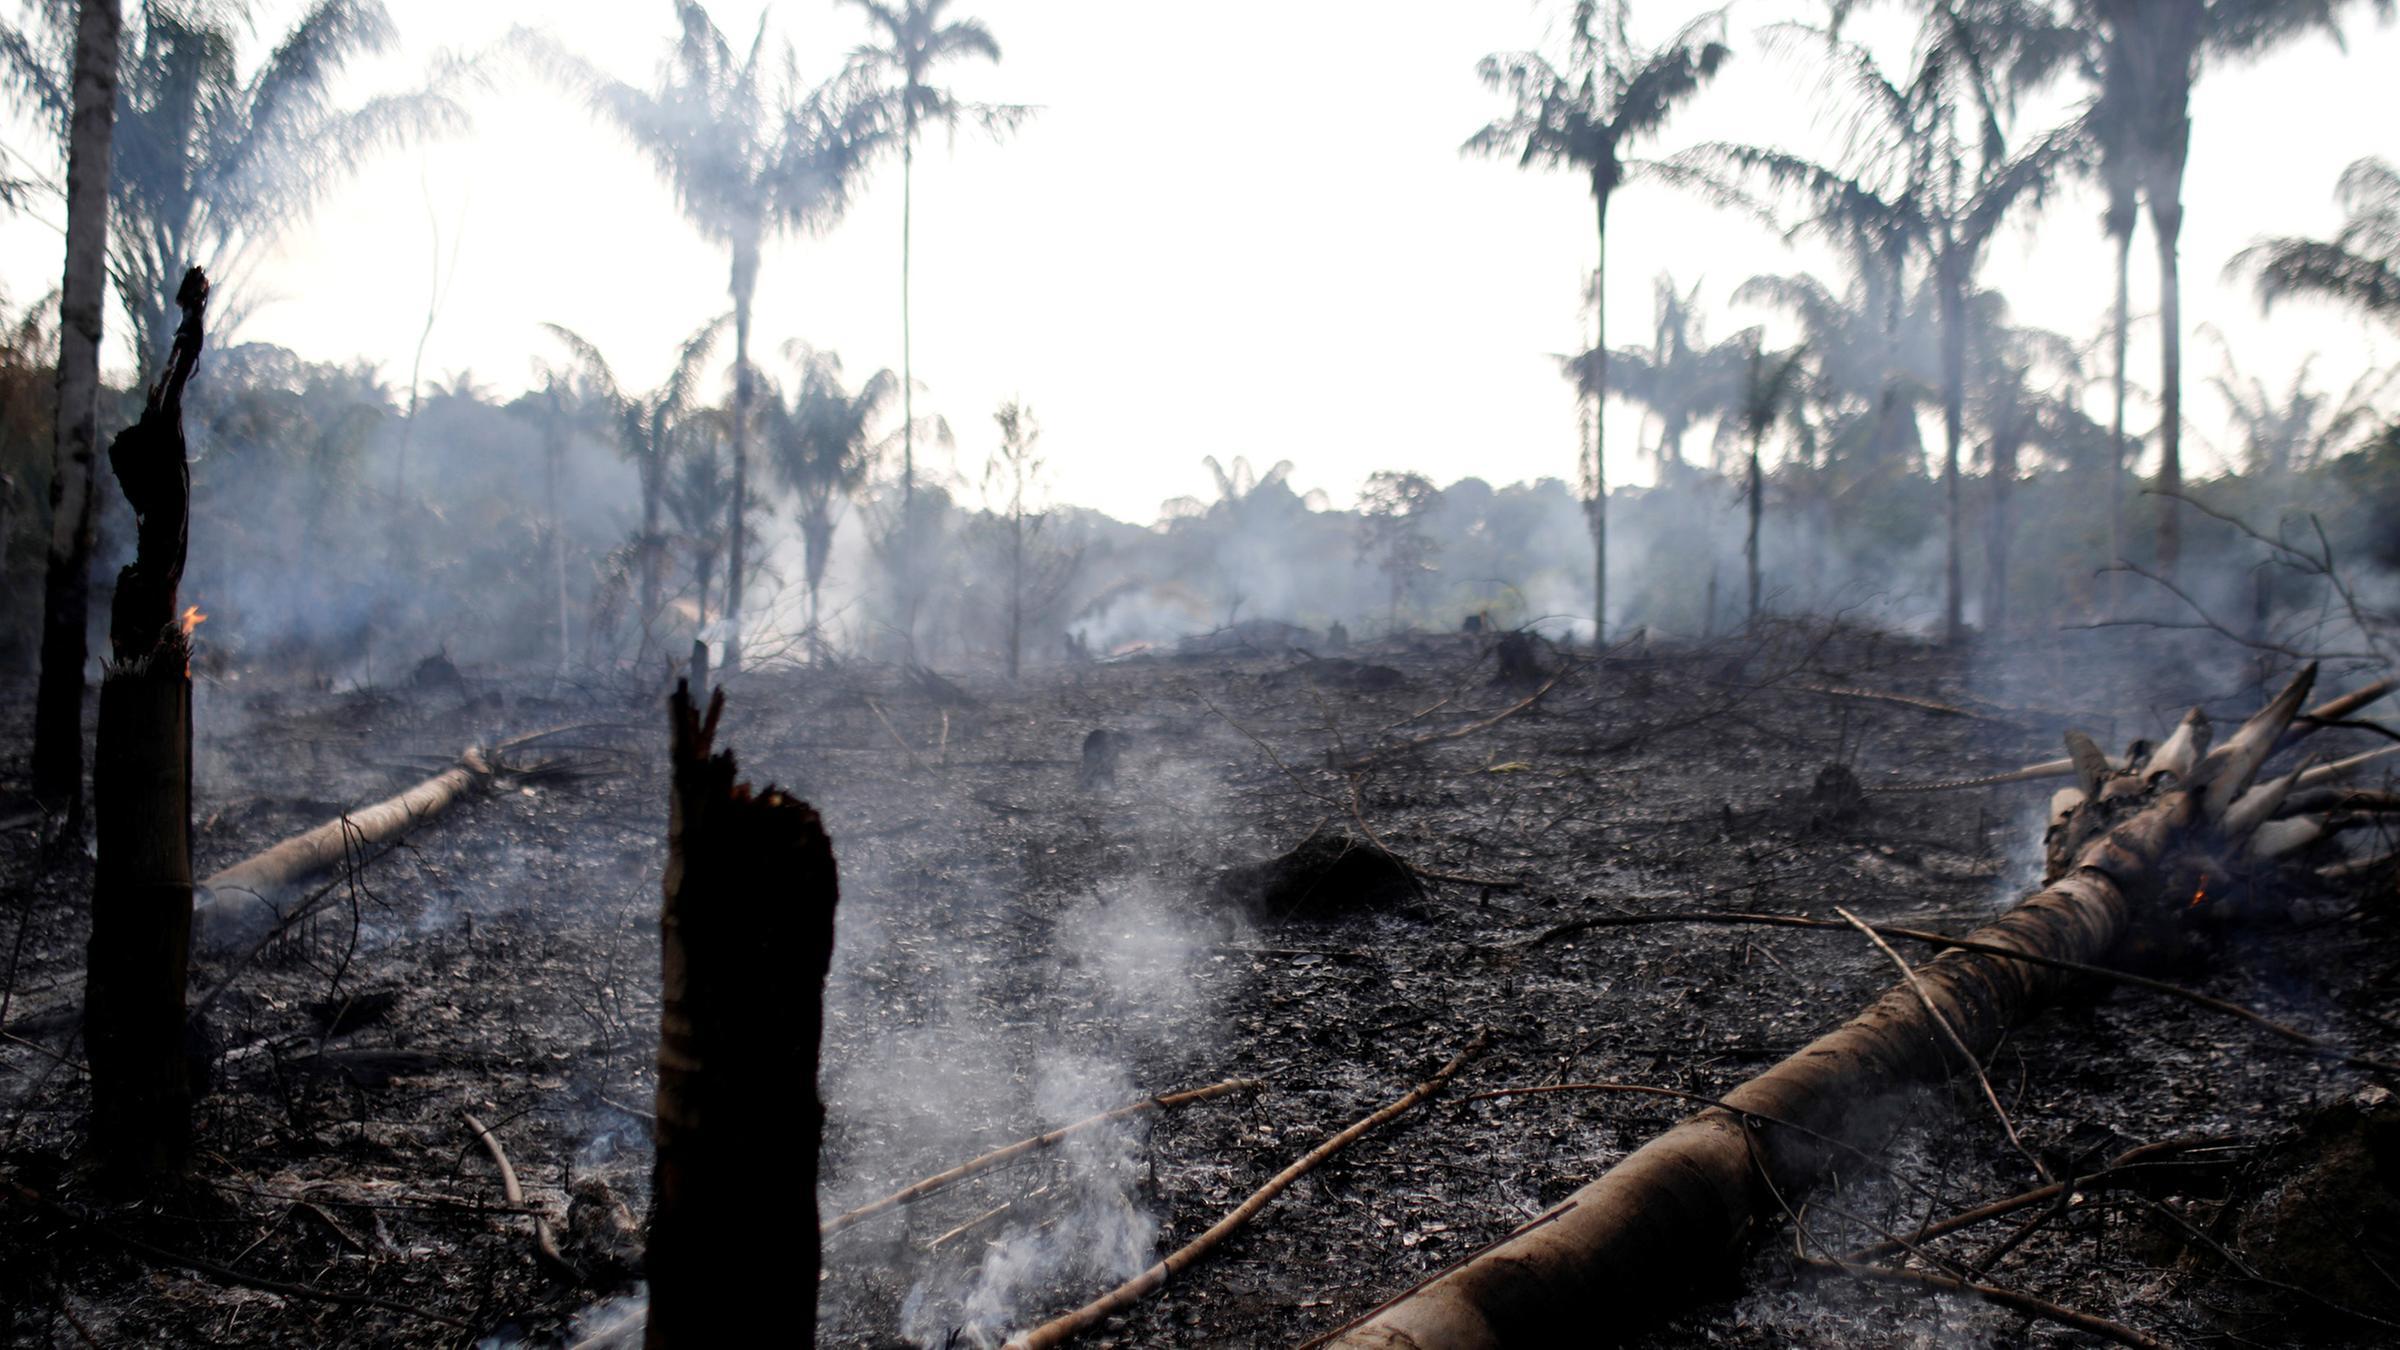 Waldbrand amazonas